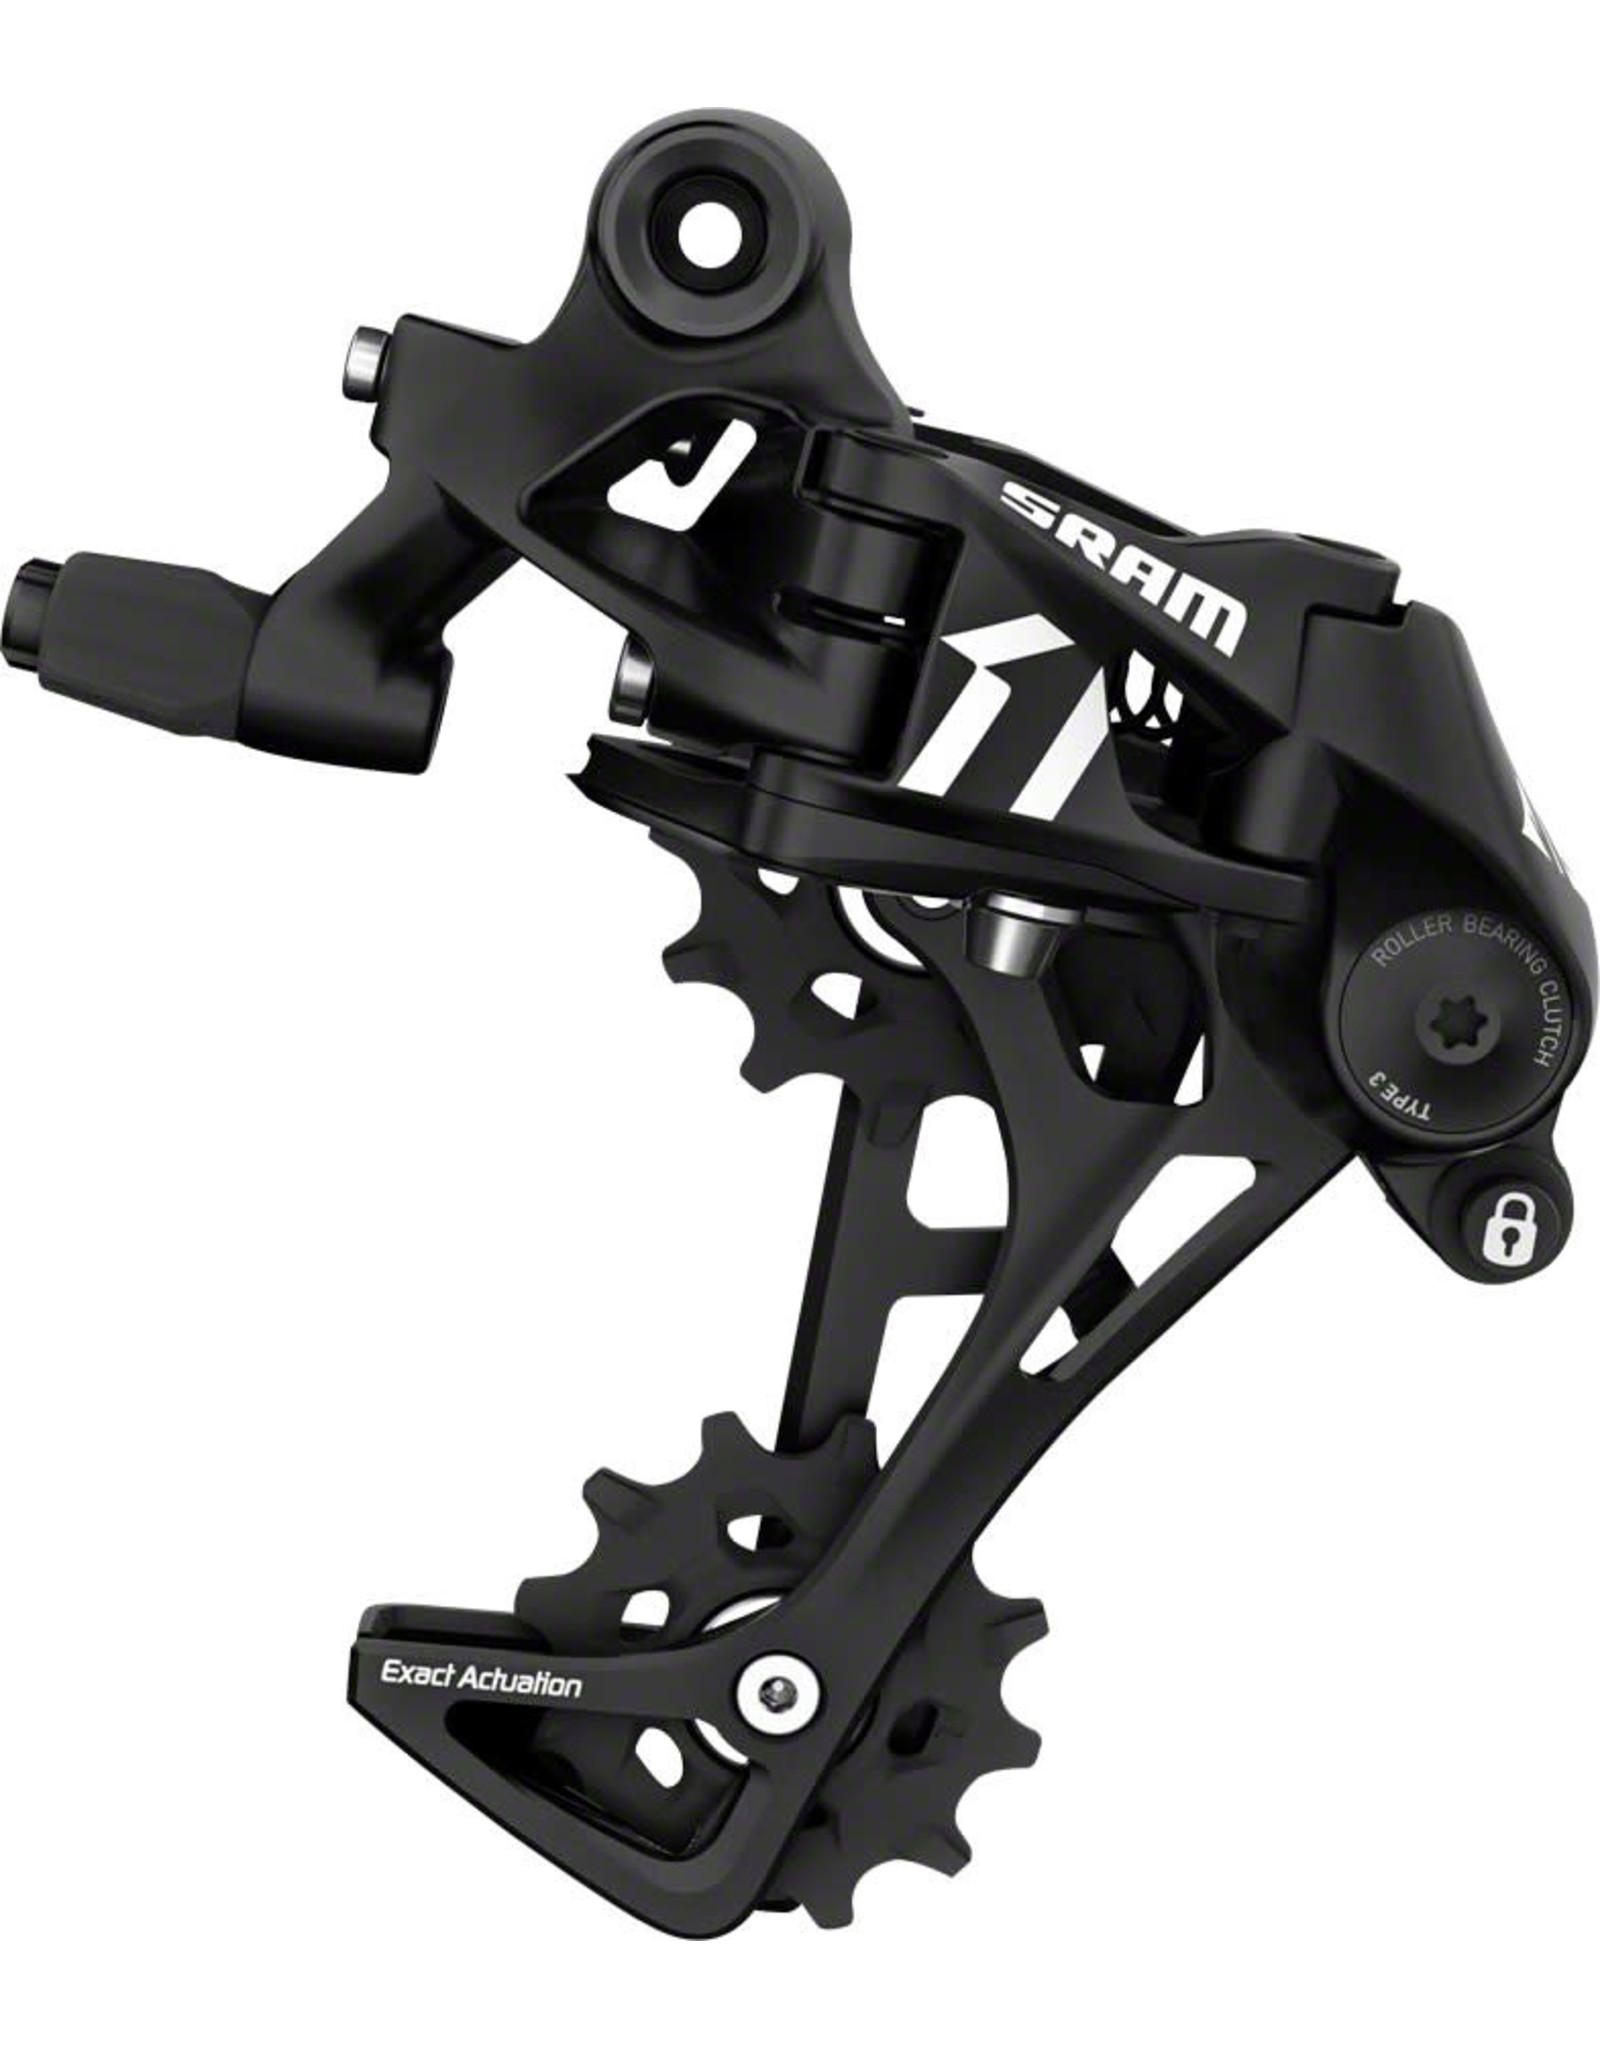 SRAM SRAM Apex Rear Derailleur - 11 Speed, Long Cage, Black